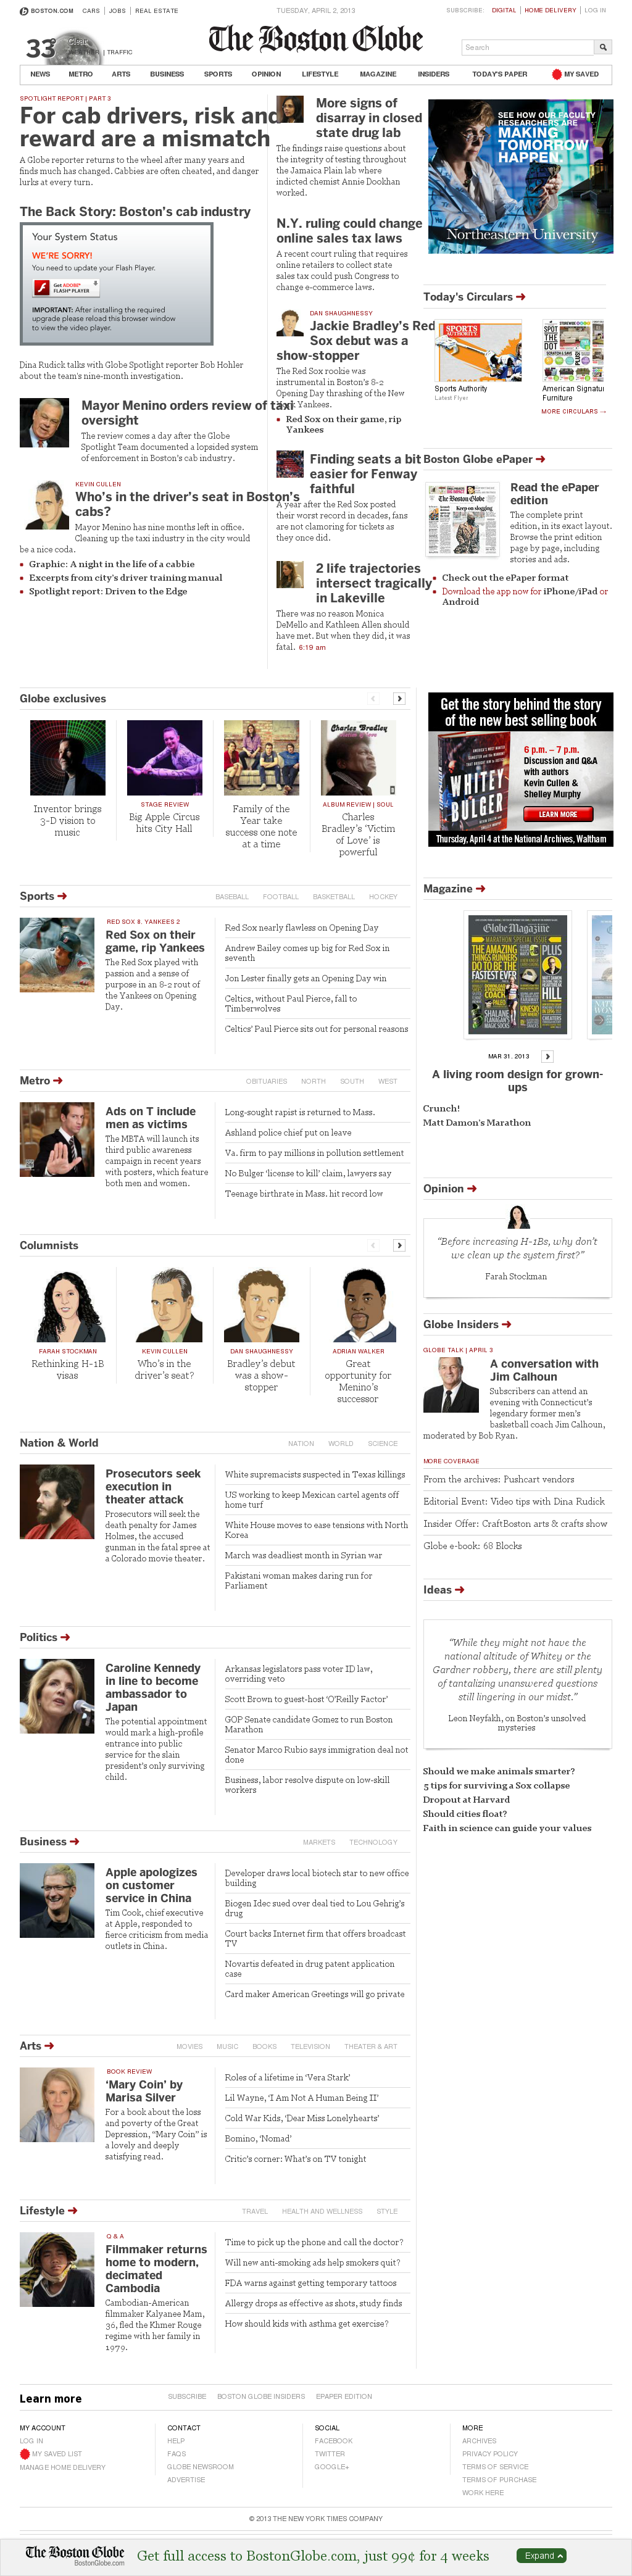 The Boston Globe at Tuesday April 2, 2013, 9:02 a.m. UTC